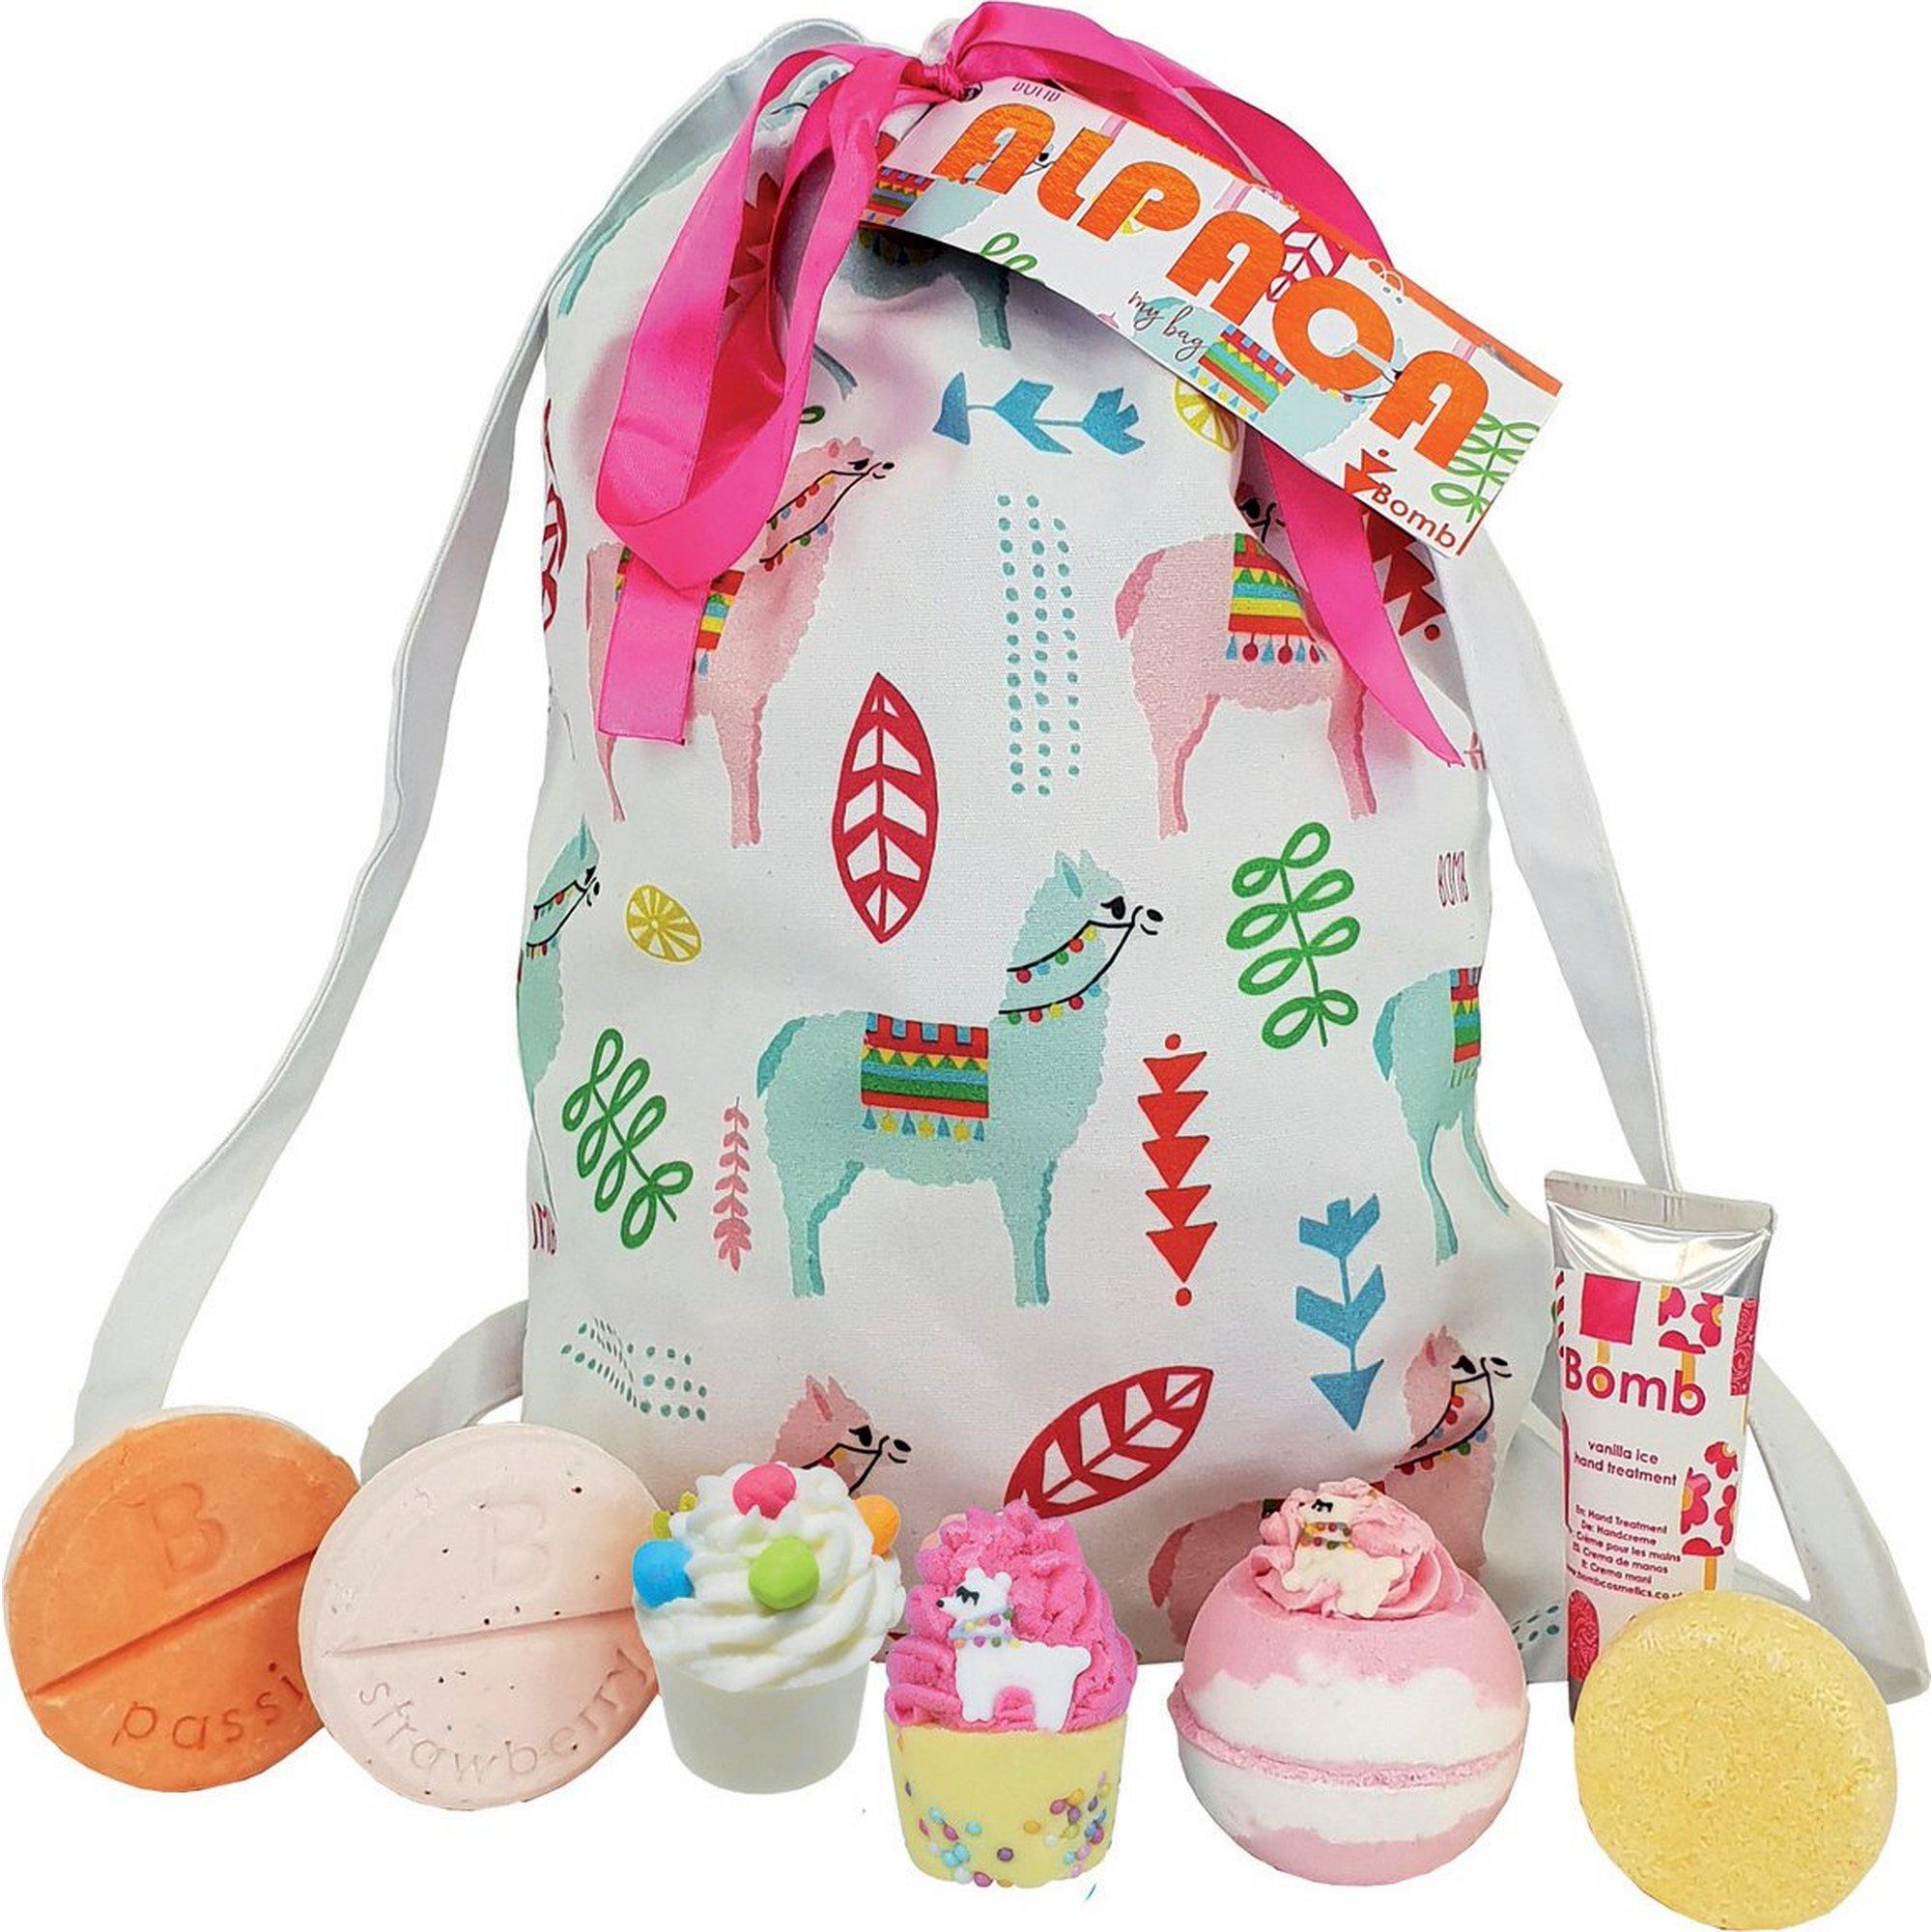 Image of Bomb Cosmetics Alpaca Bath Bomb Sack Set